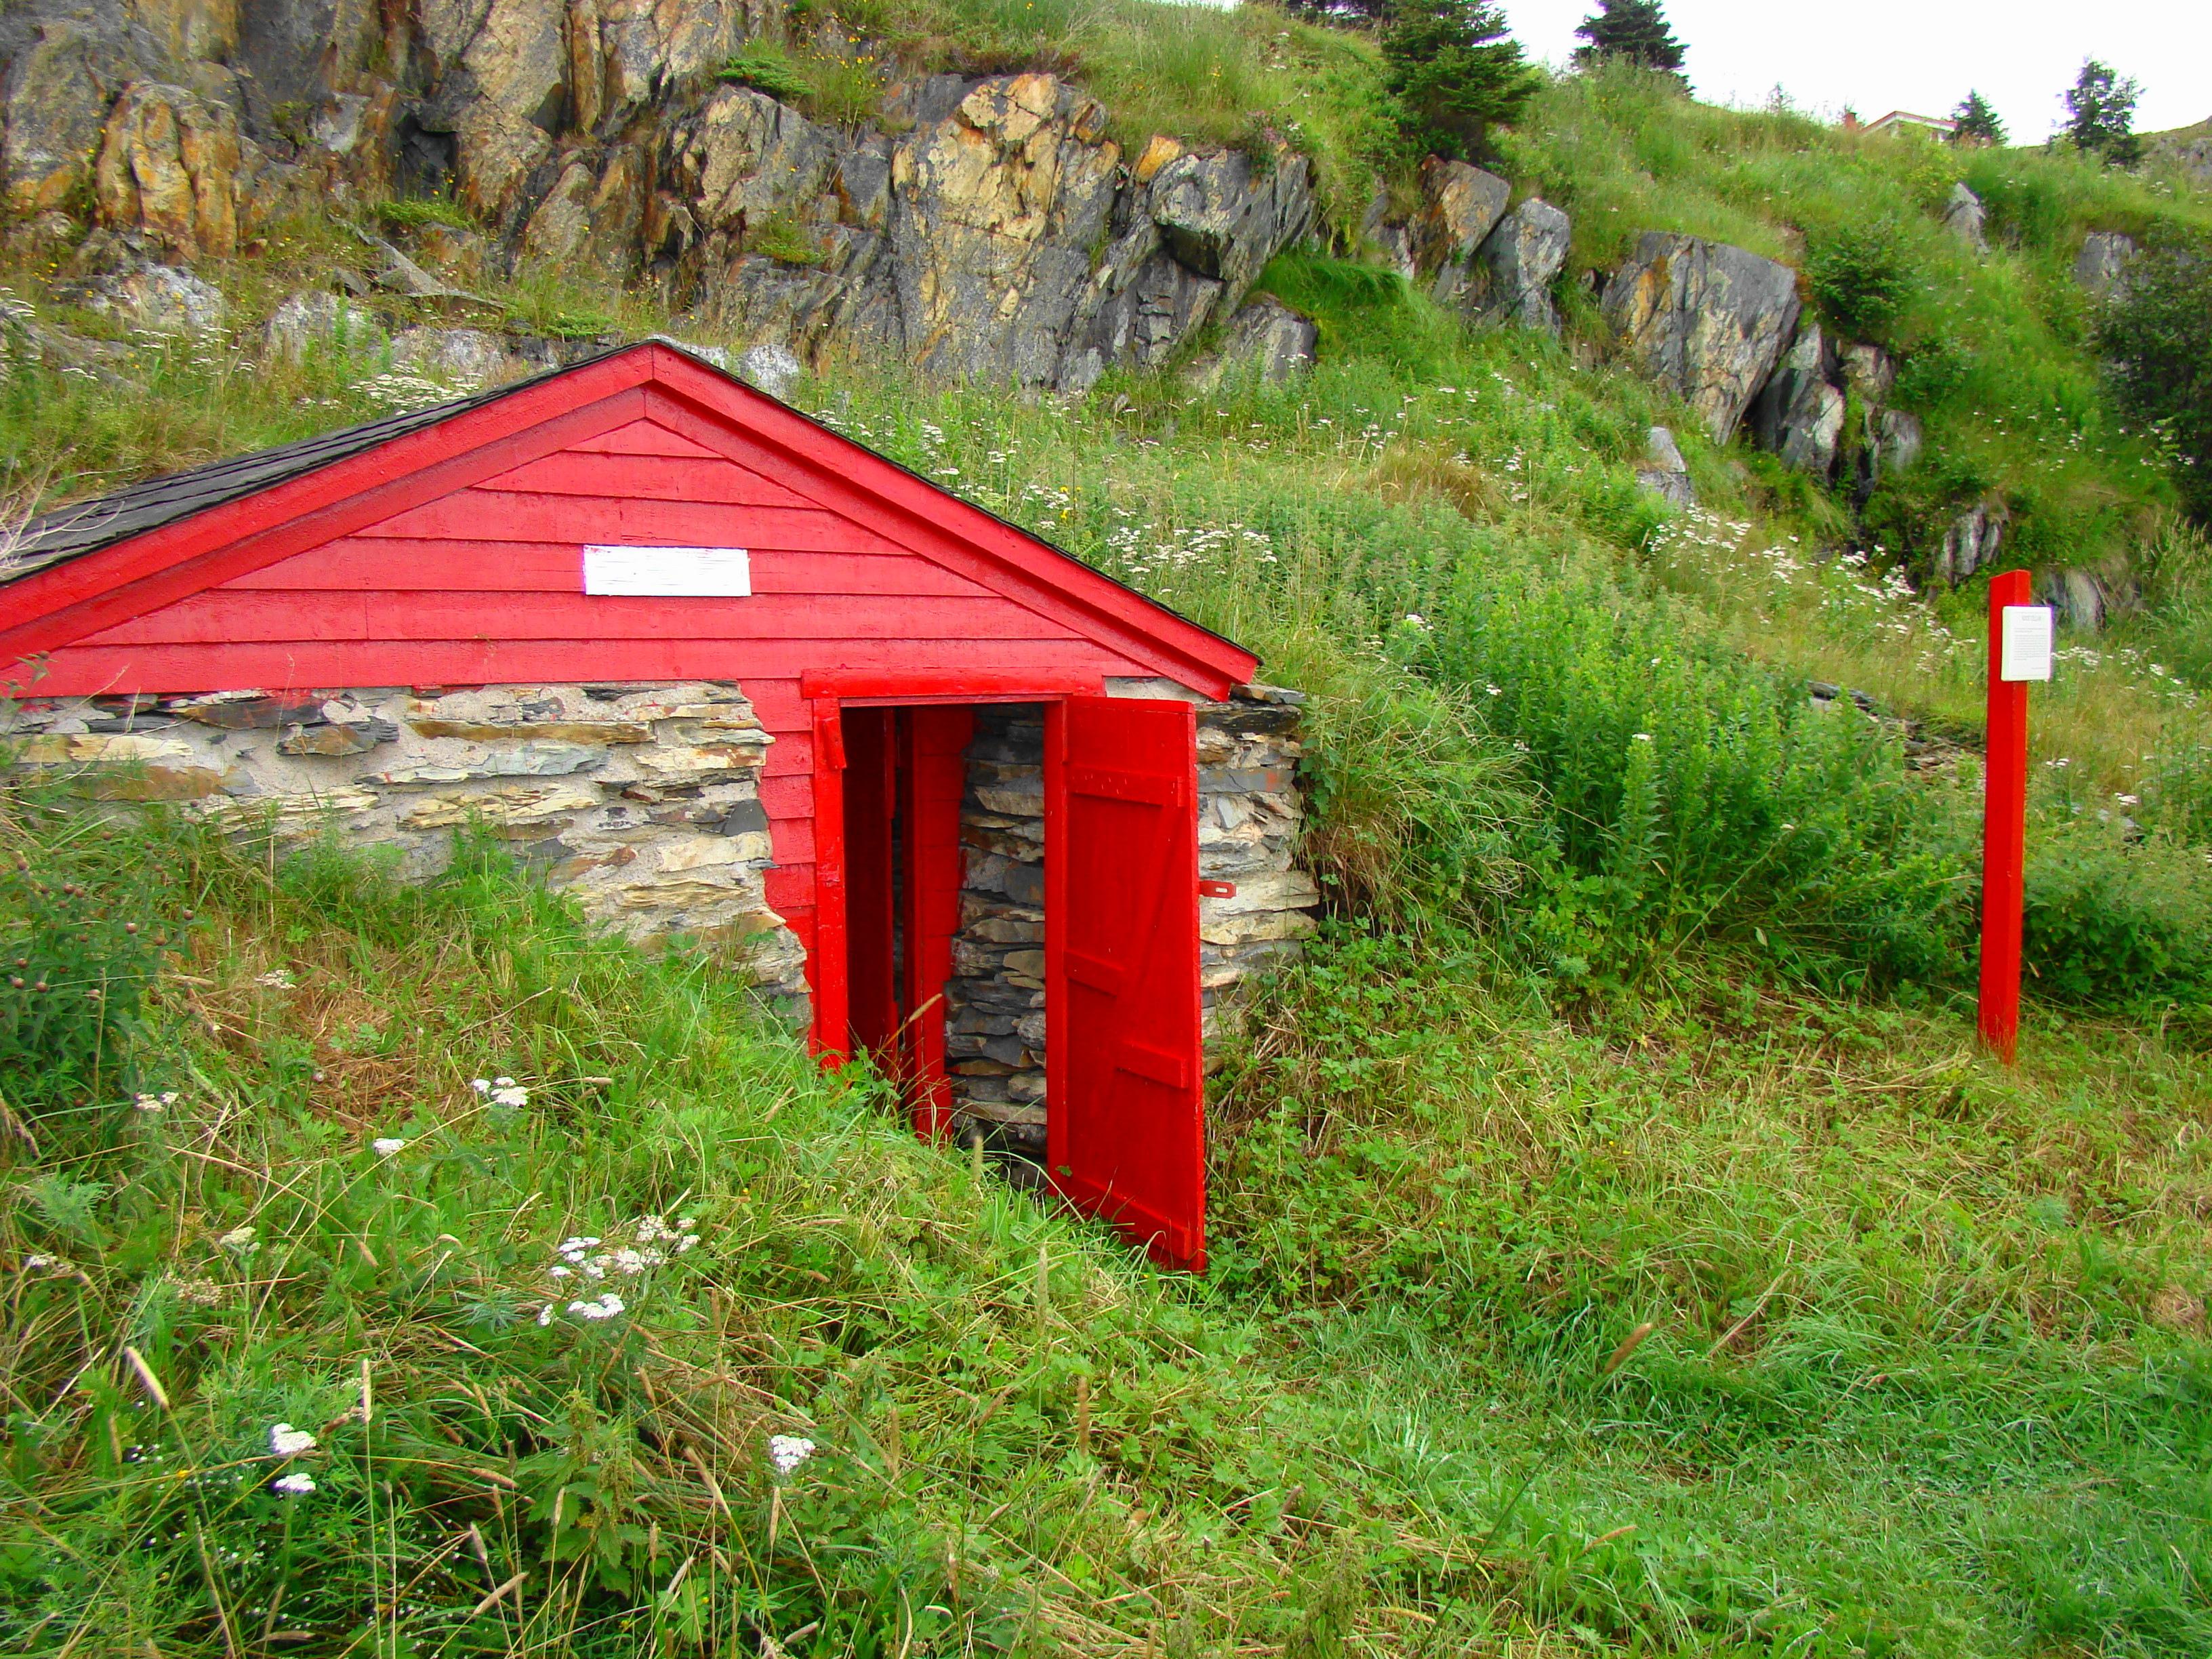 FileRoot Cellar At Bay Roberts NewfoundlandJPG Wikimedia Commons